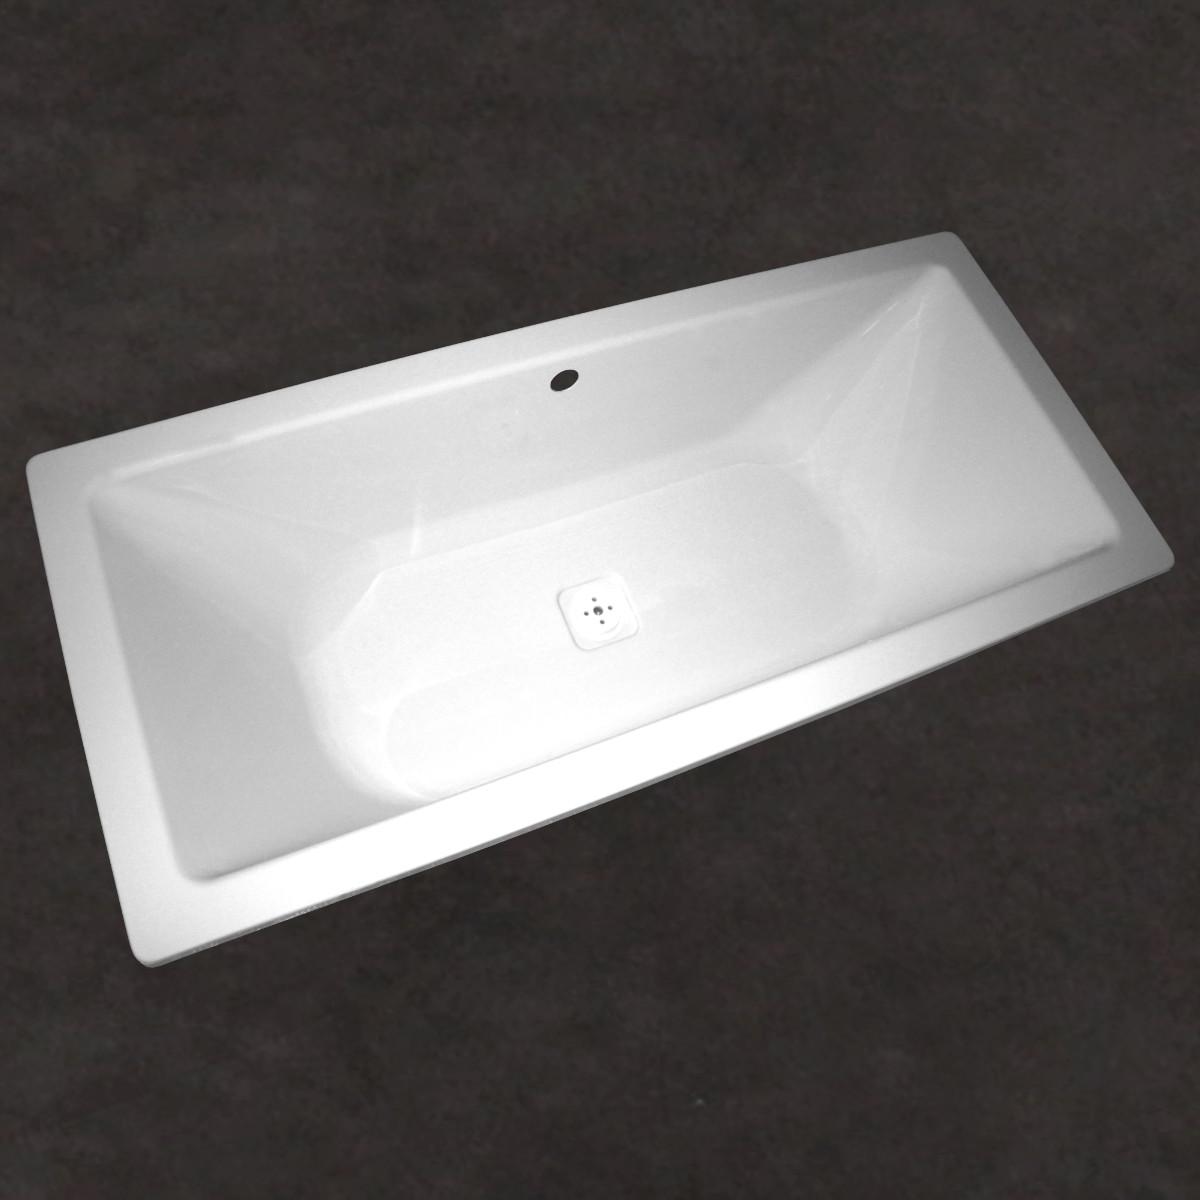 kaldewei conoduo 733 rechteck badewanne 180 x 80 x 43 cm. Black Bedroom Furniture Sets. Home Design Ideas